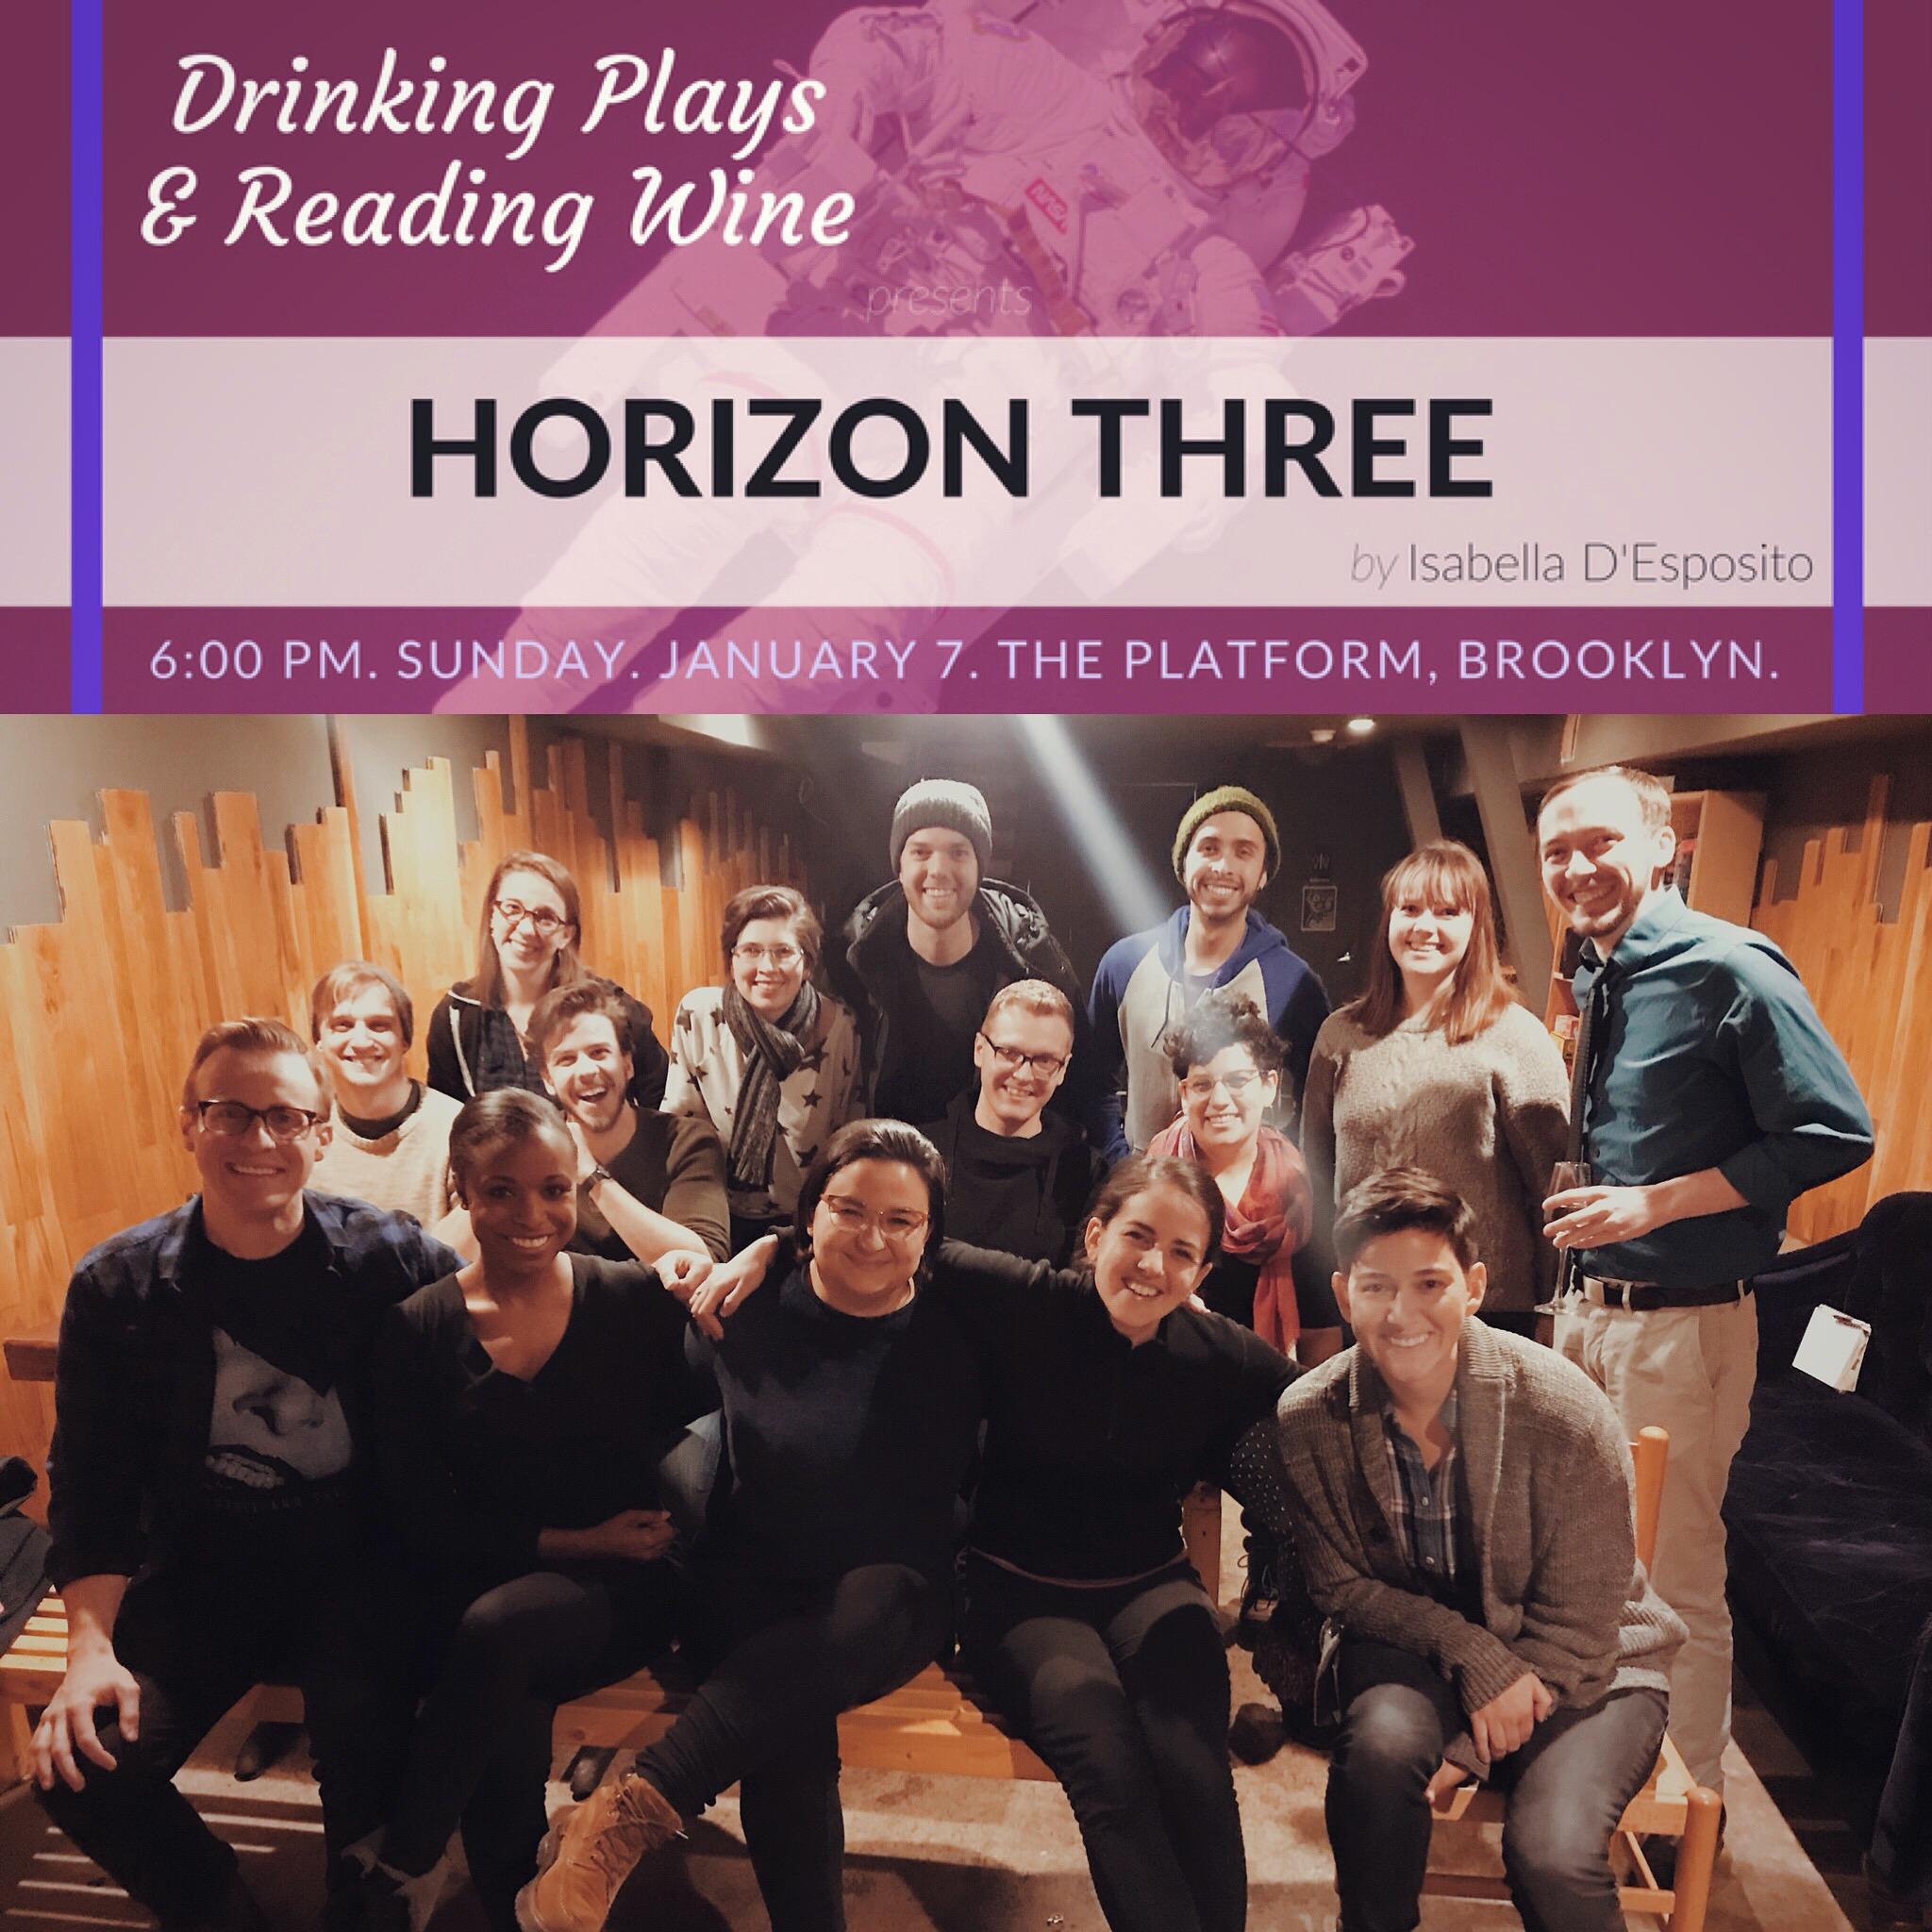 32. *HORIZON THREE by Isabella D'Esposito